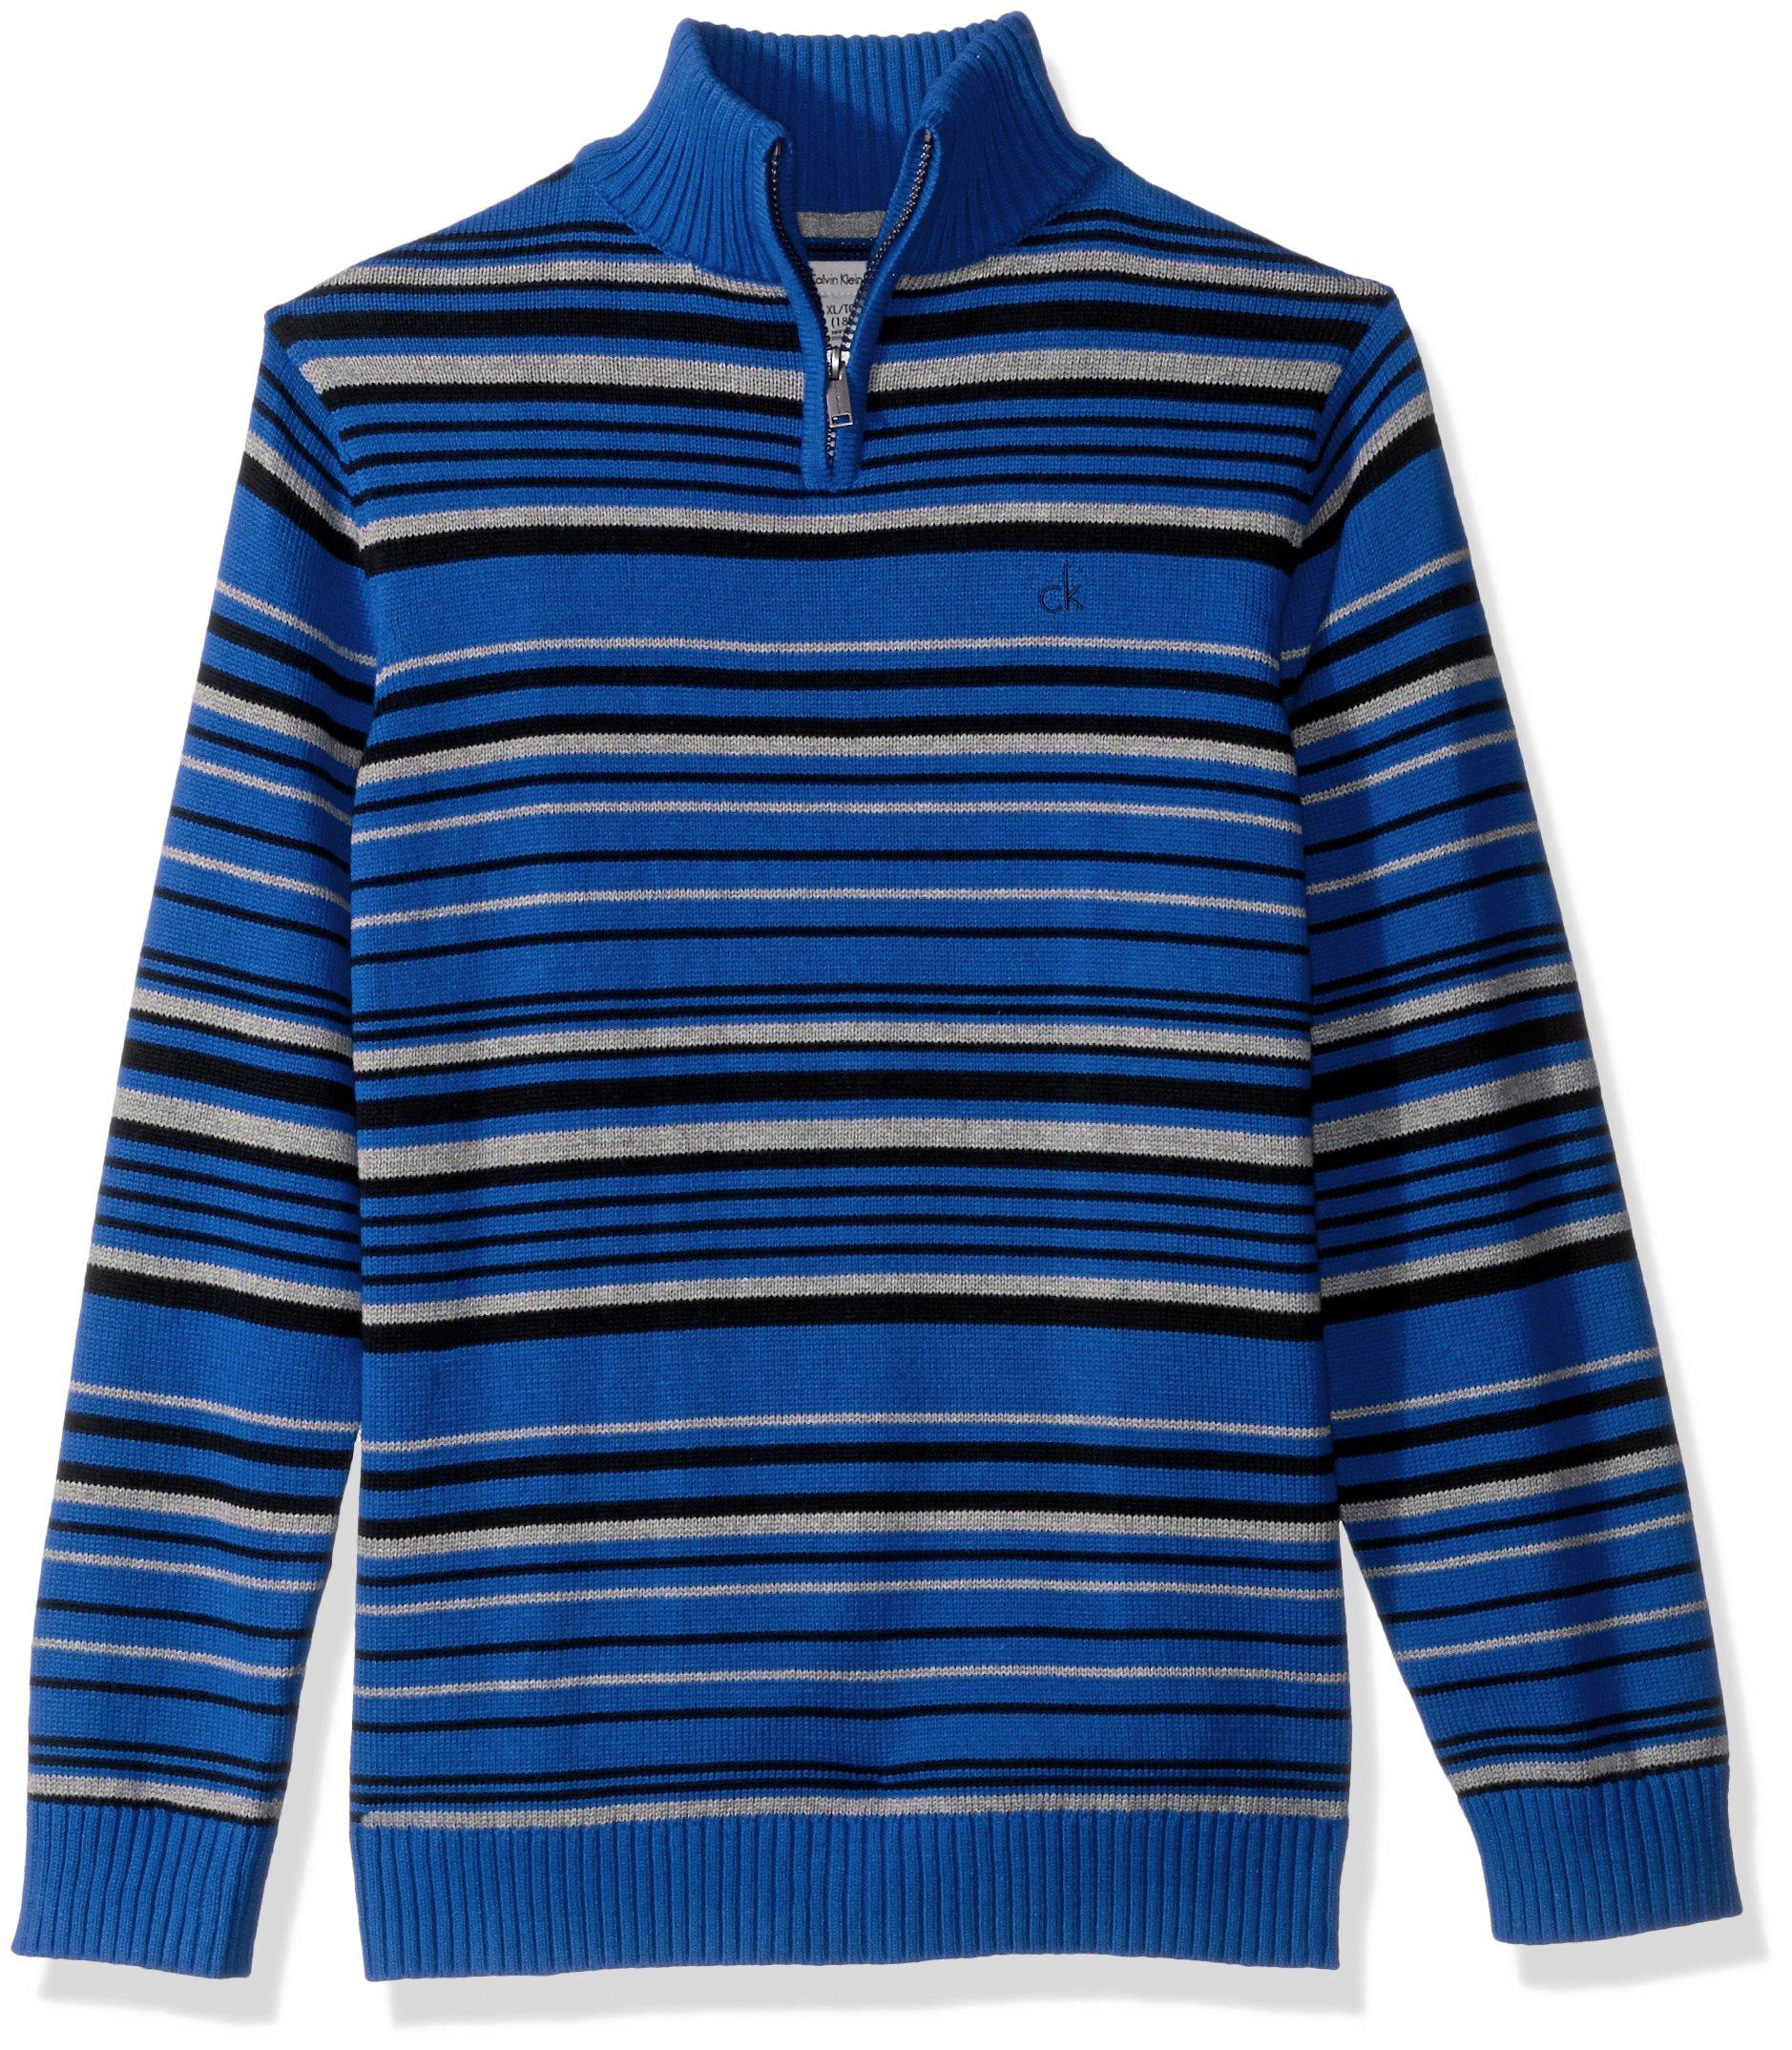 Calvin Klein Boys' Big Focal Stripe Half-Zip Sweater, Blue, X-Large (18/20)